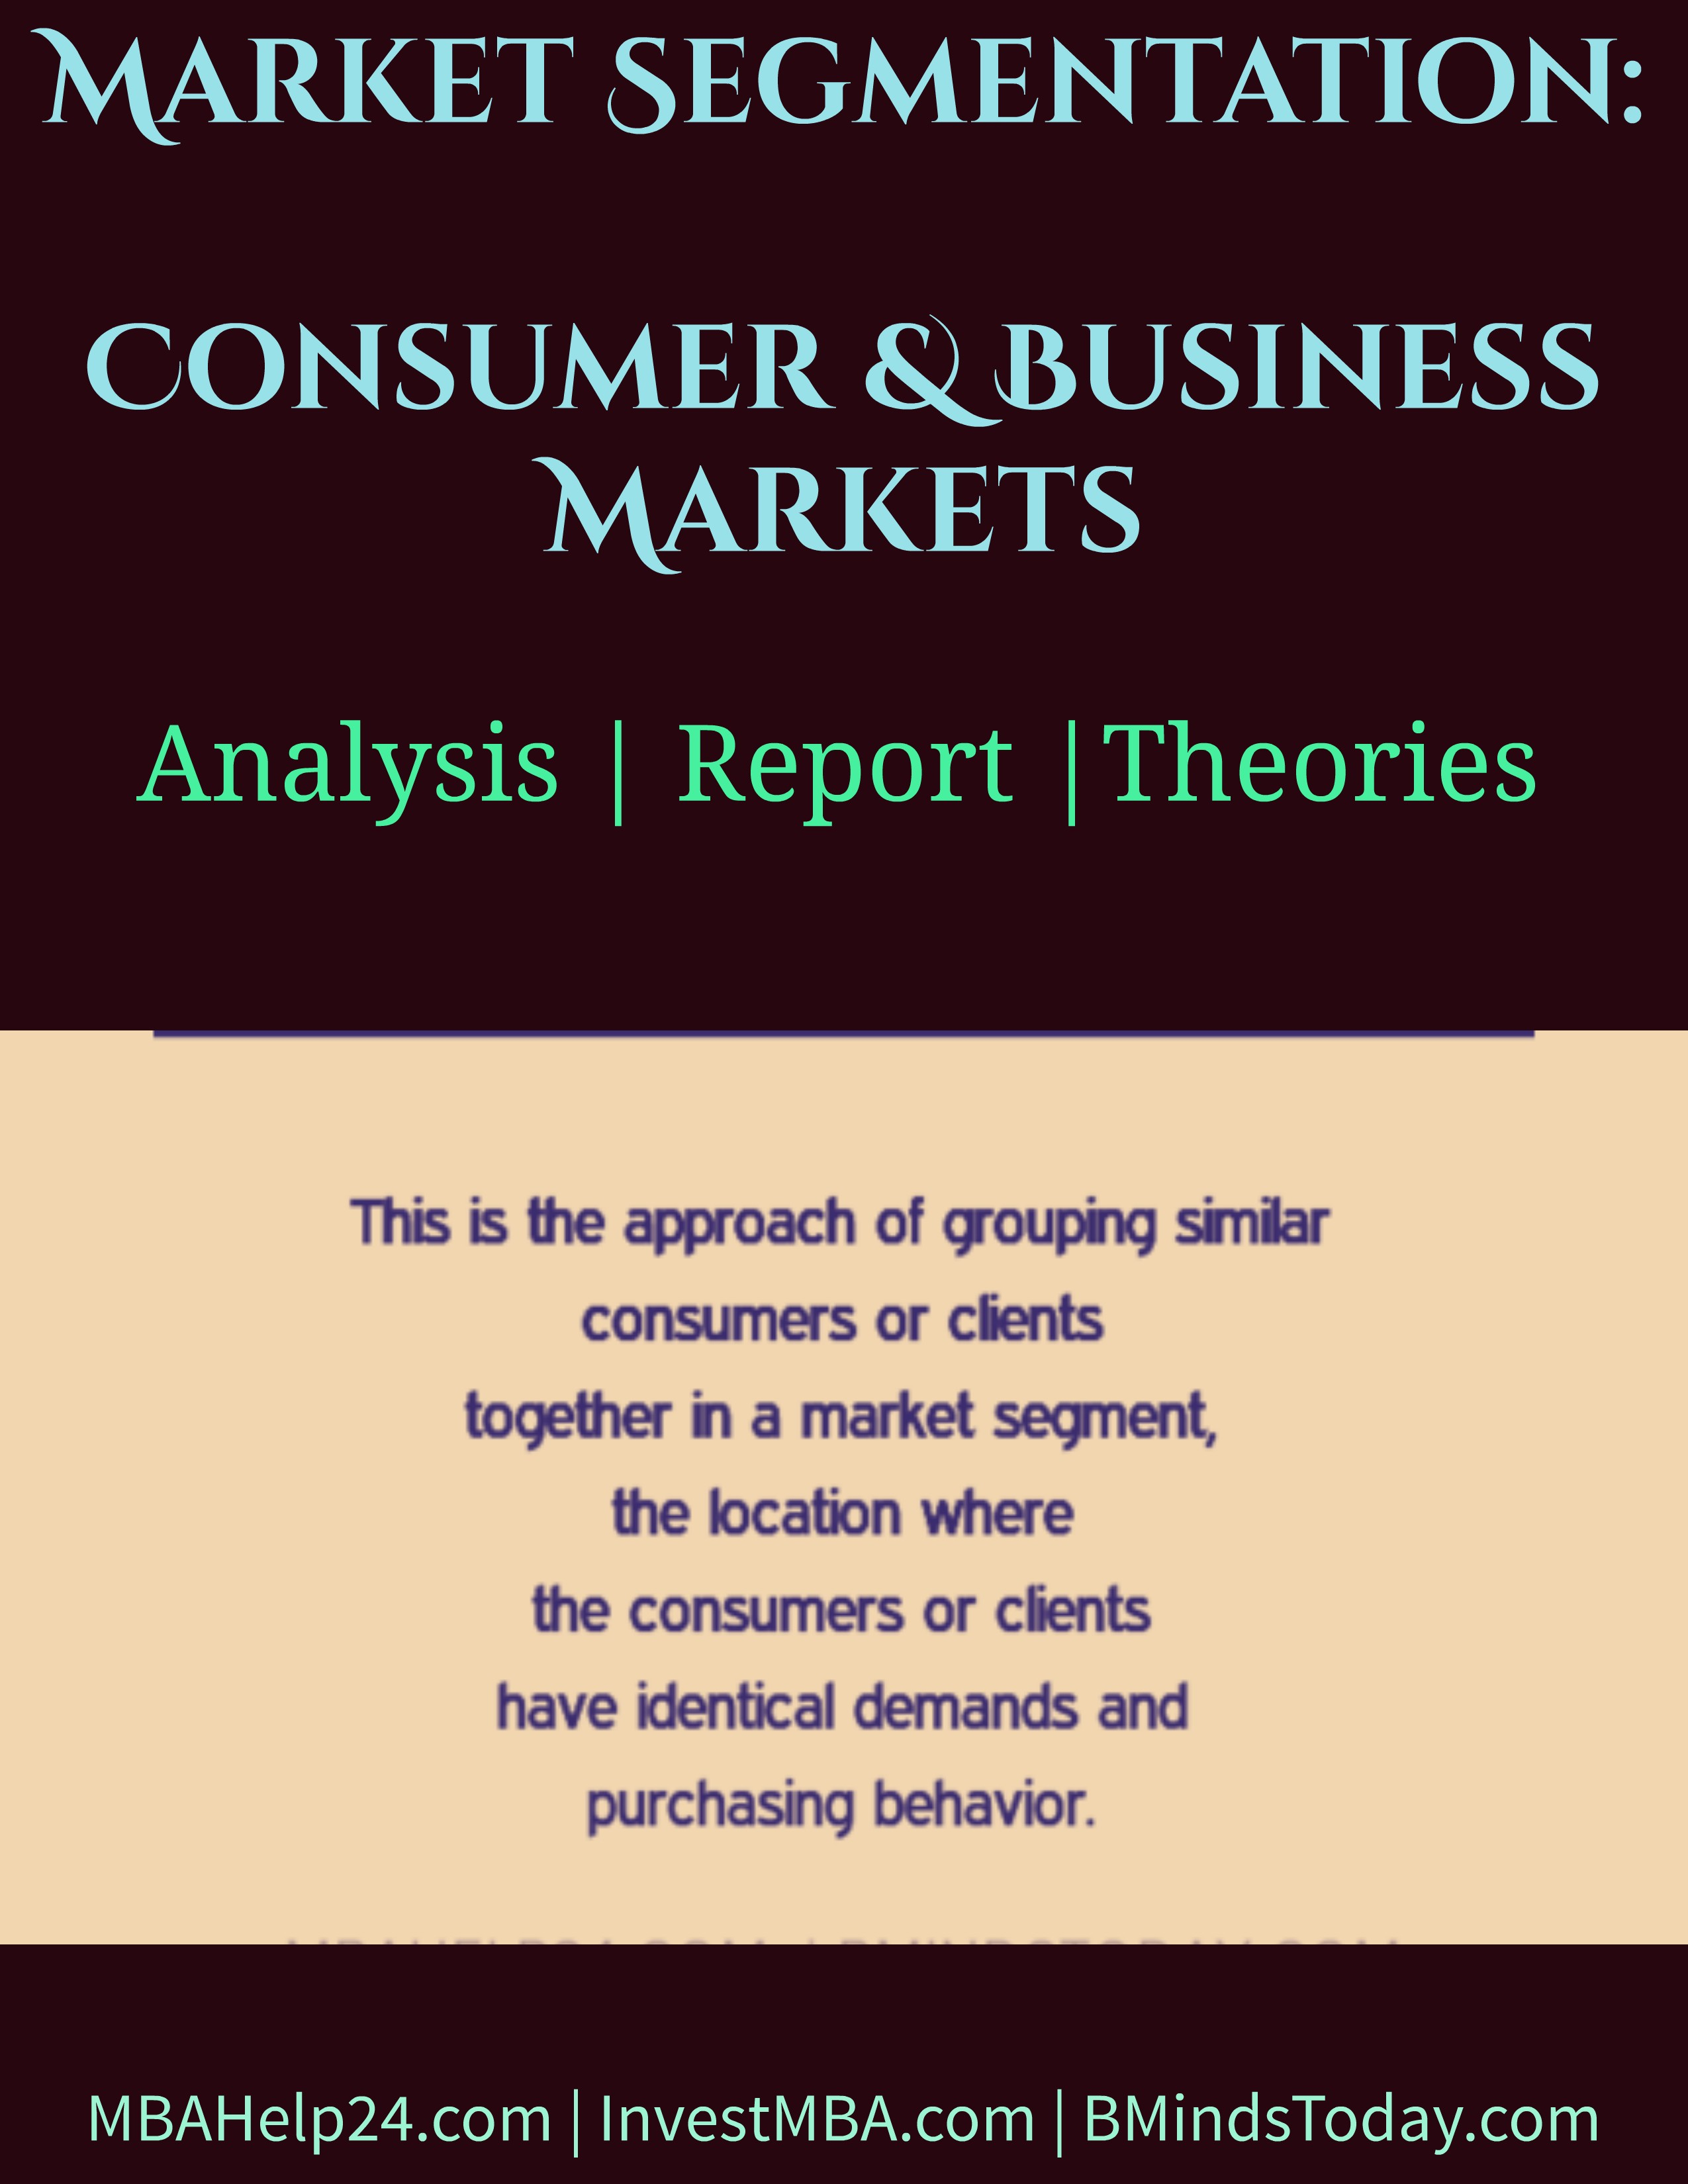 Market Segmentation | Consumer & Business Markets market segmentation Market Segmentation: Consumer & Business Markets Market Segmentation Consumer Business Markets